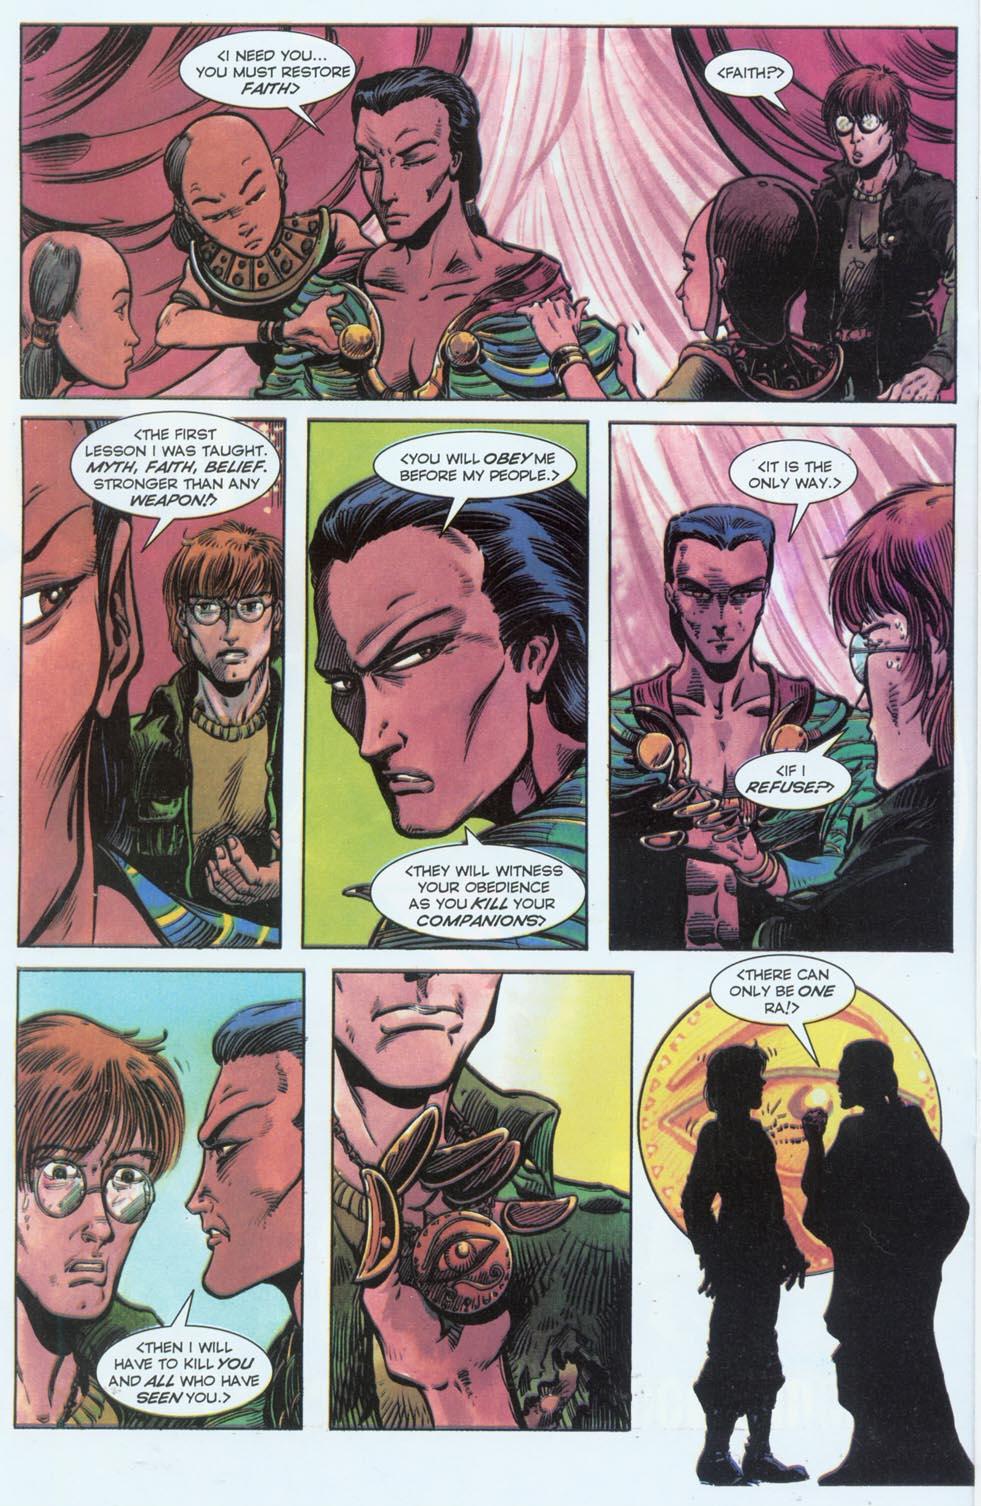 Read online Stargate comic -  Issue #3 - 14